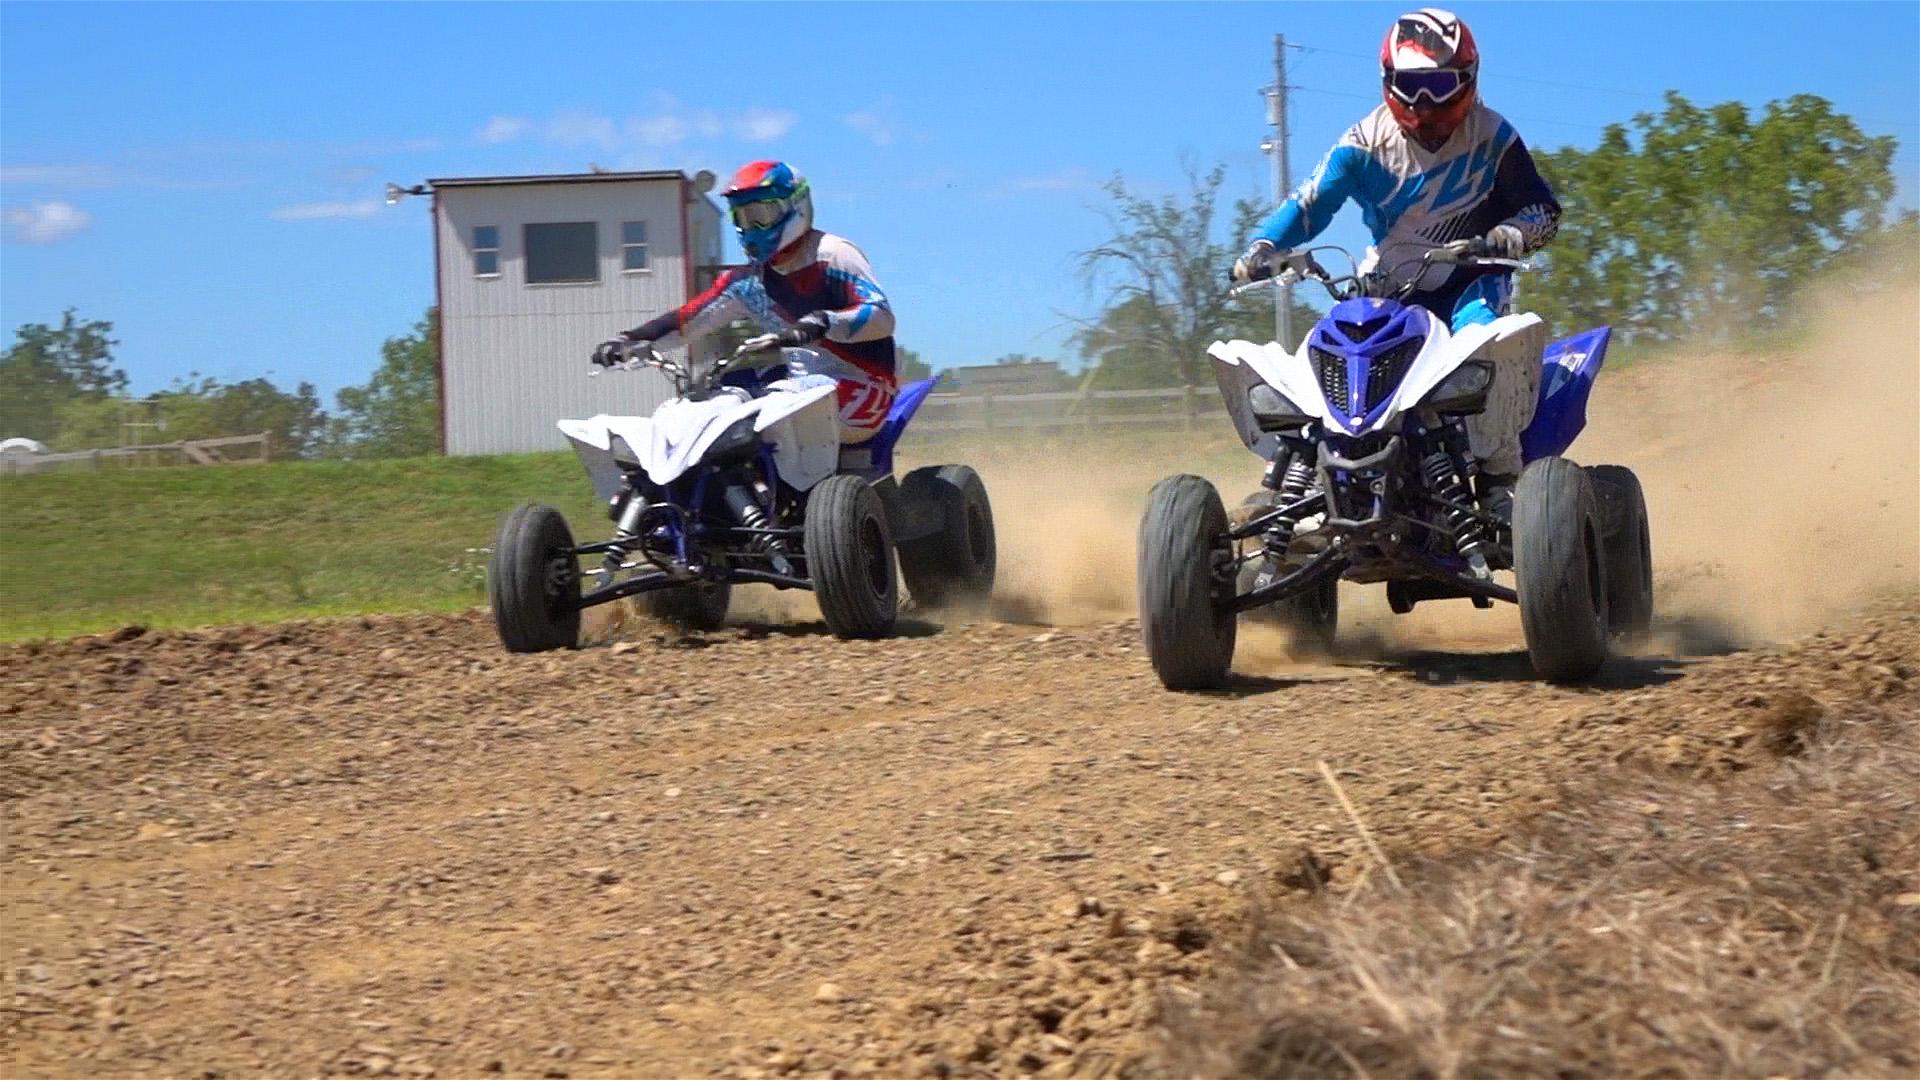 Yamaha Raptor YFZ450R VS Raptor 700R Shootout: WITH VIDEO